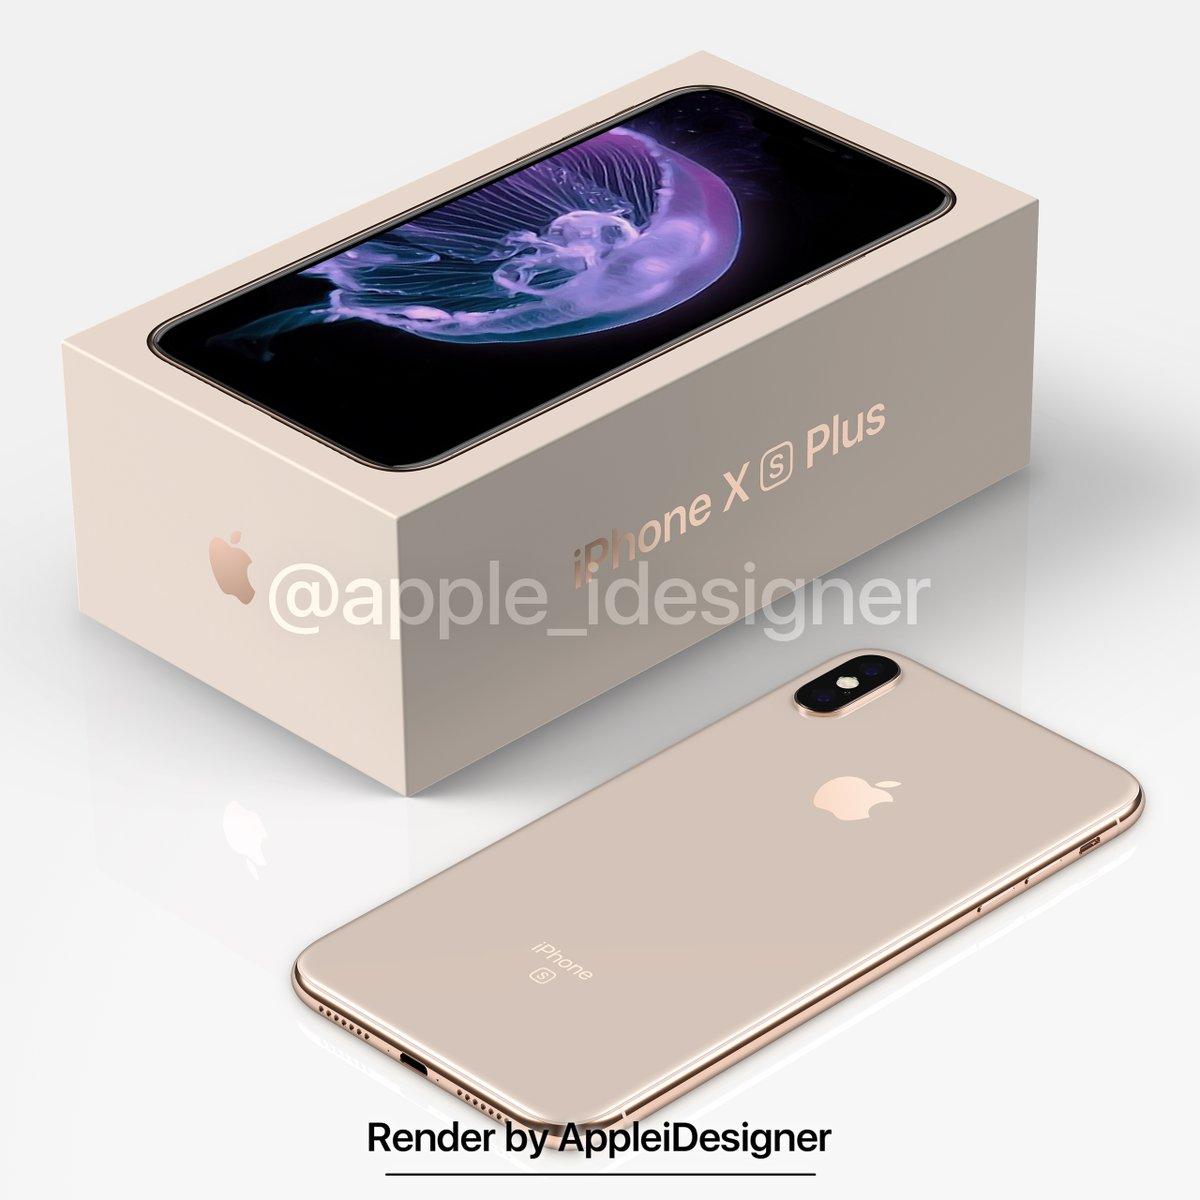 Iphone X Plus Render By Appleidesigner 1